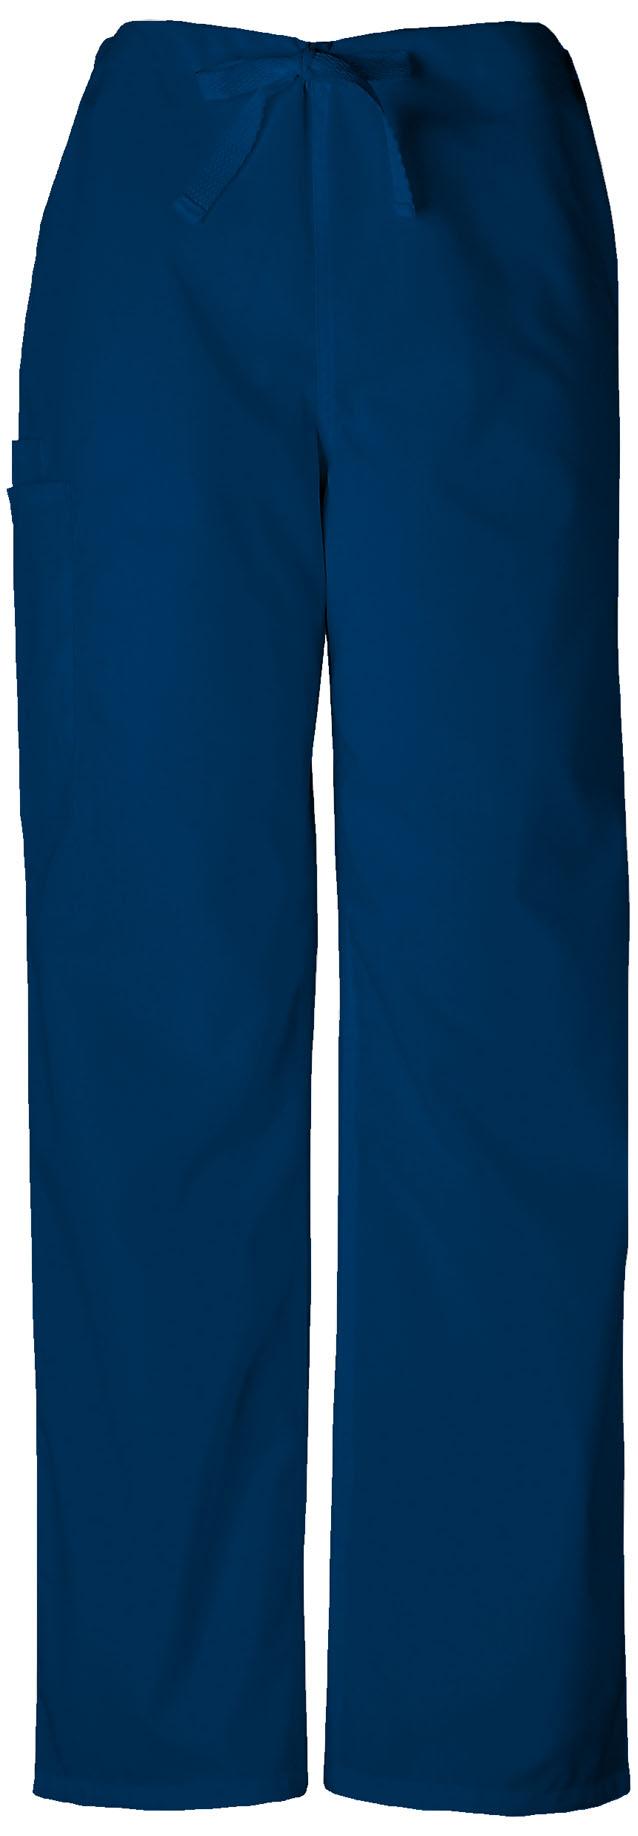 Unisex Drawstring Pants-